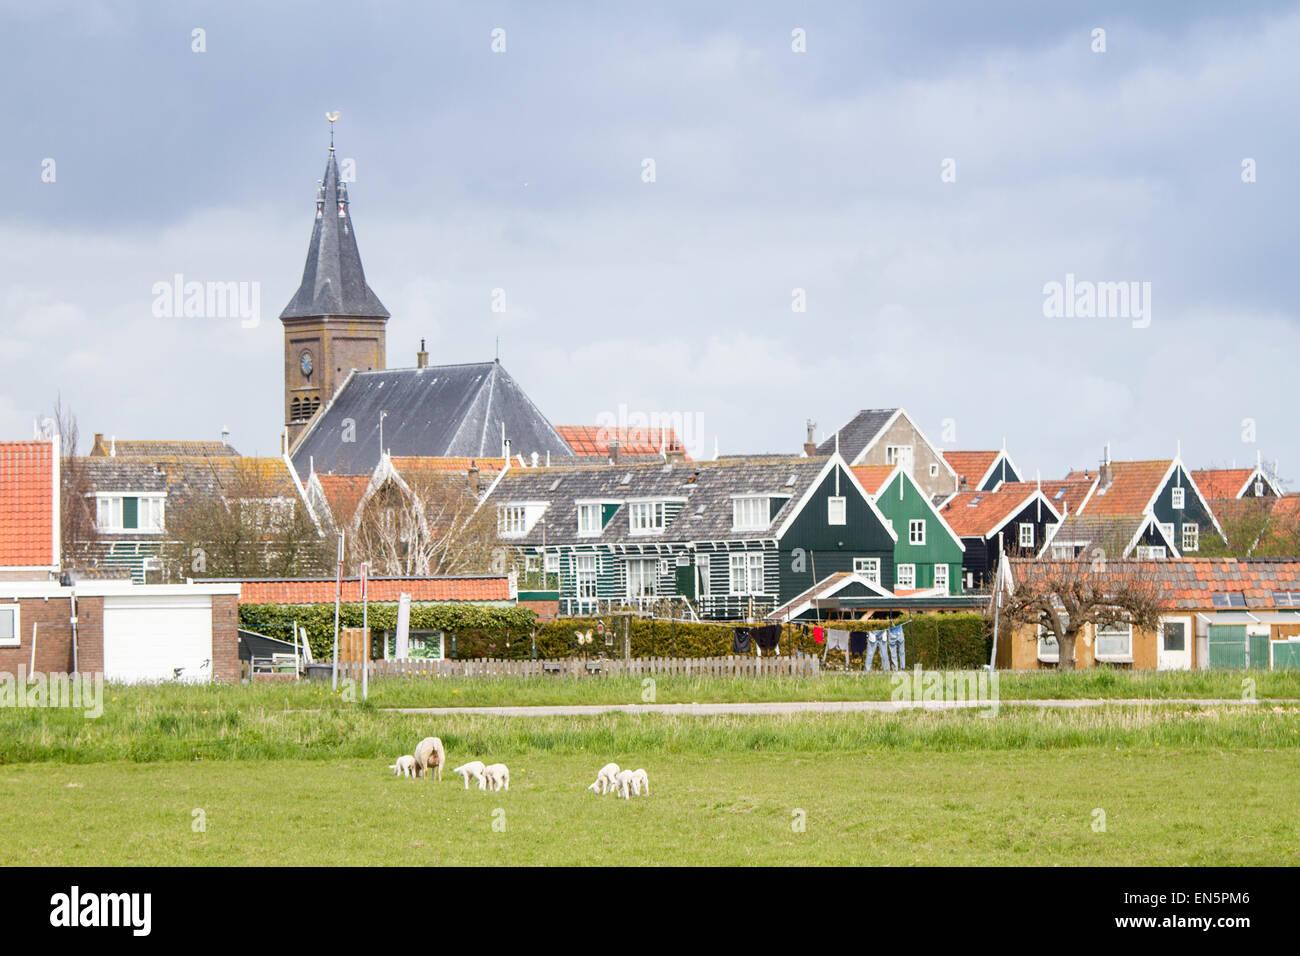 Grote Kerk, Marken, Holland - Stock Image